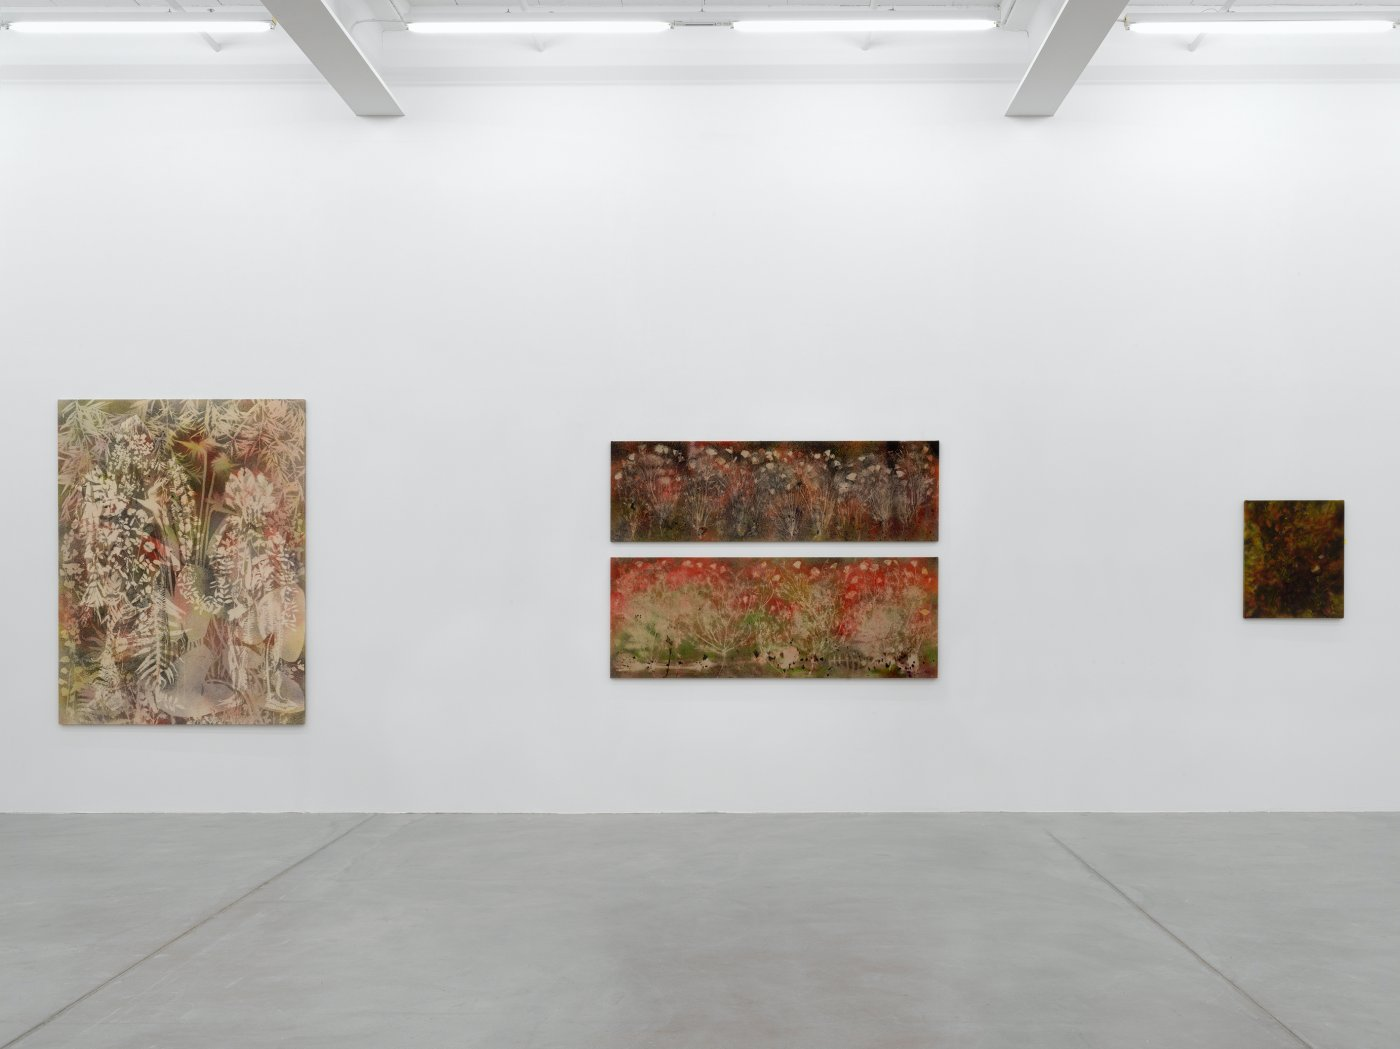 Galerie Eva Presenhuber Maag Areal Sam Falls 10